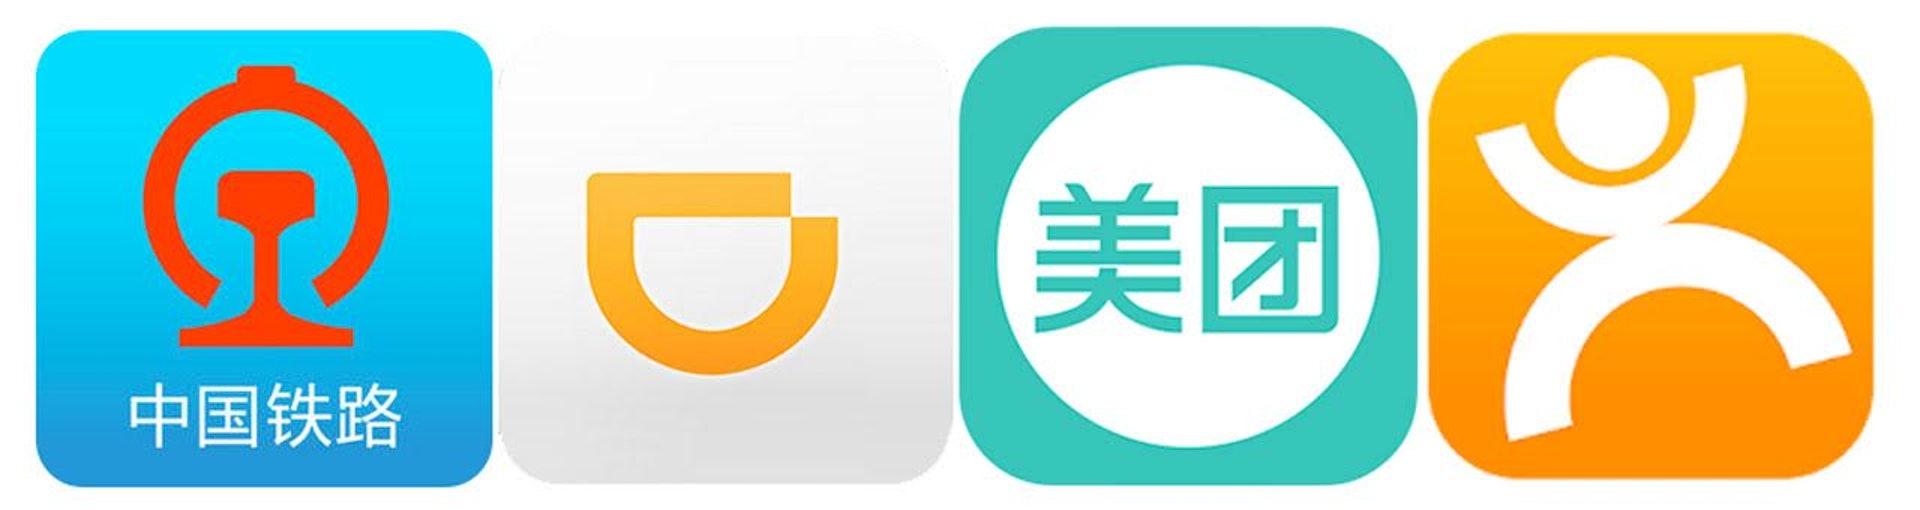 WeChat Pay 的跨境支付為分階段推行的新服務,目前只有少量商戶的 App 支援,分別為《高鐵12306》、《滴滴出行》、《美團》與《大眾點評》。